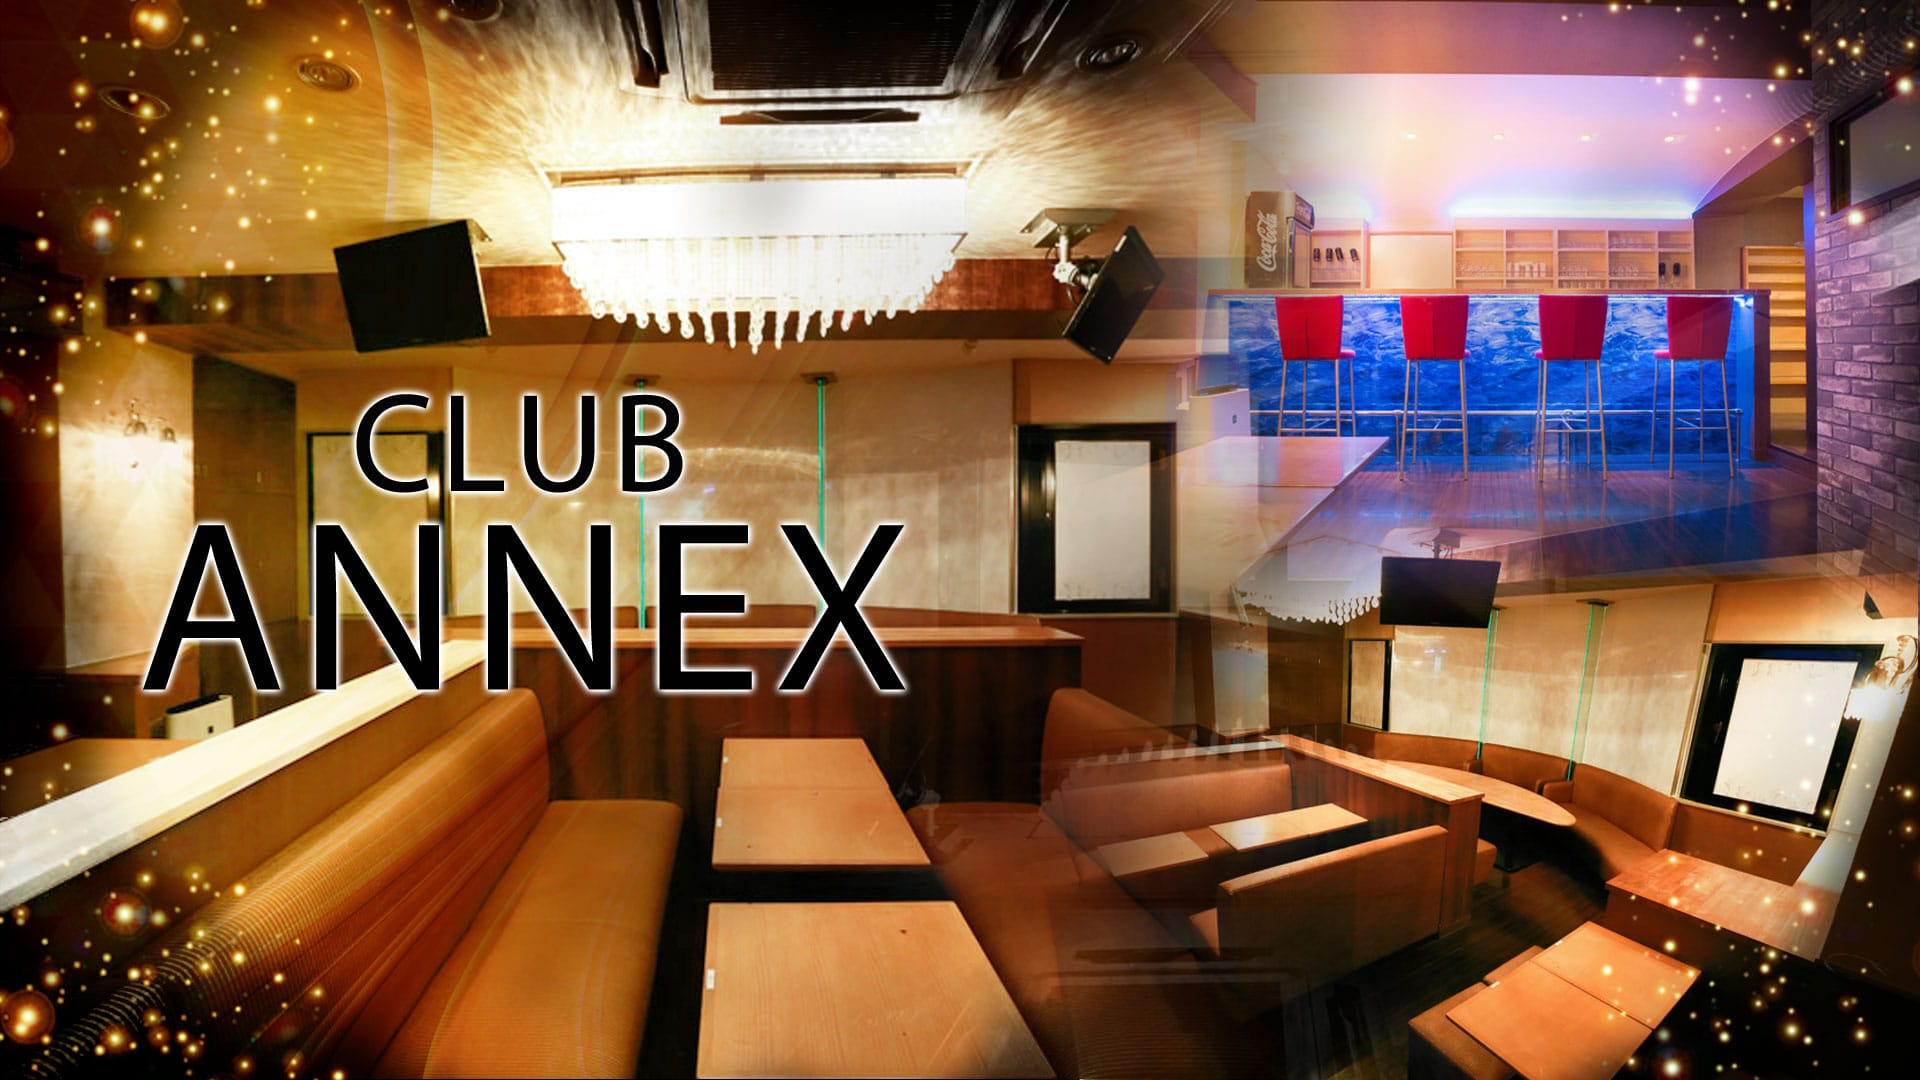 Club ANNEX(アネックス) ひばりヶ丘キャバクラ TOP画像